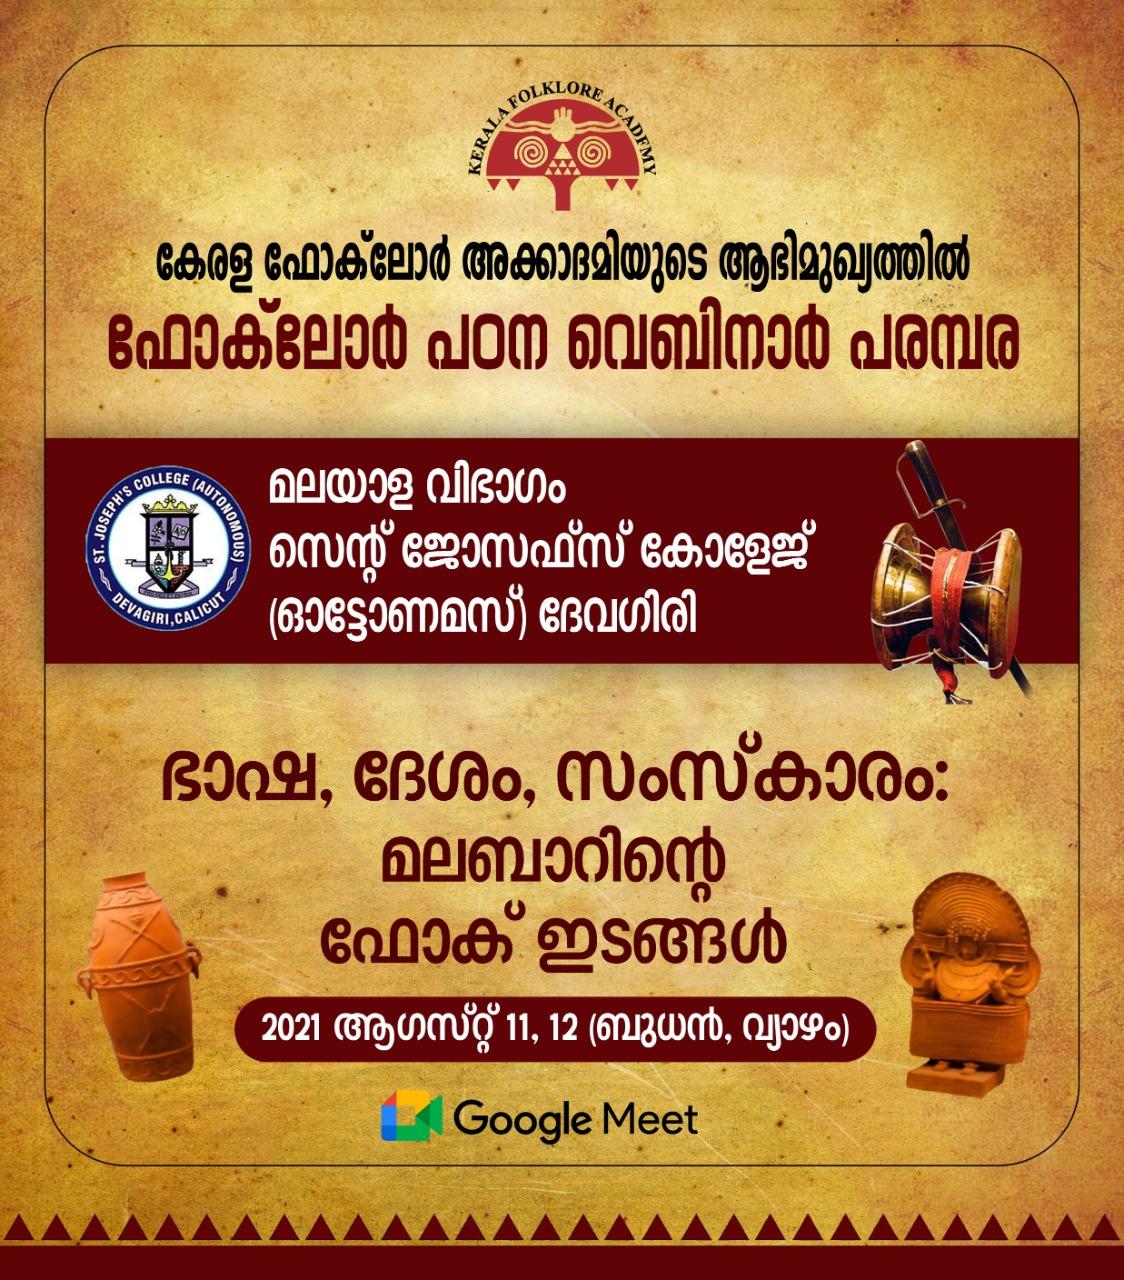 Department of Malayalam